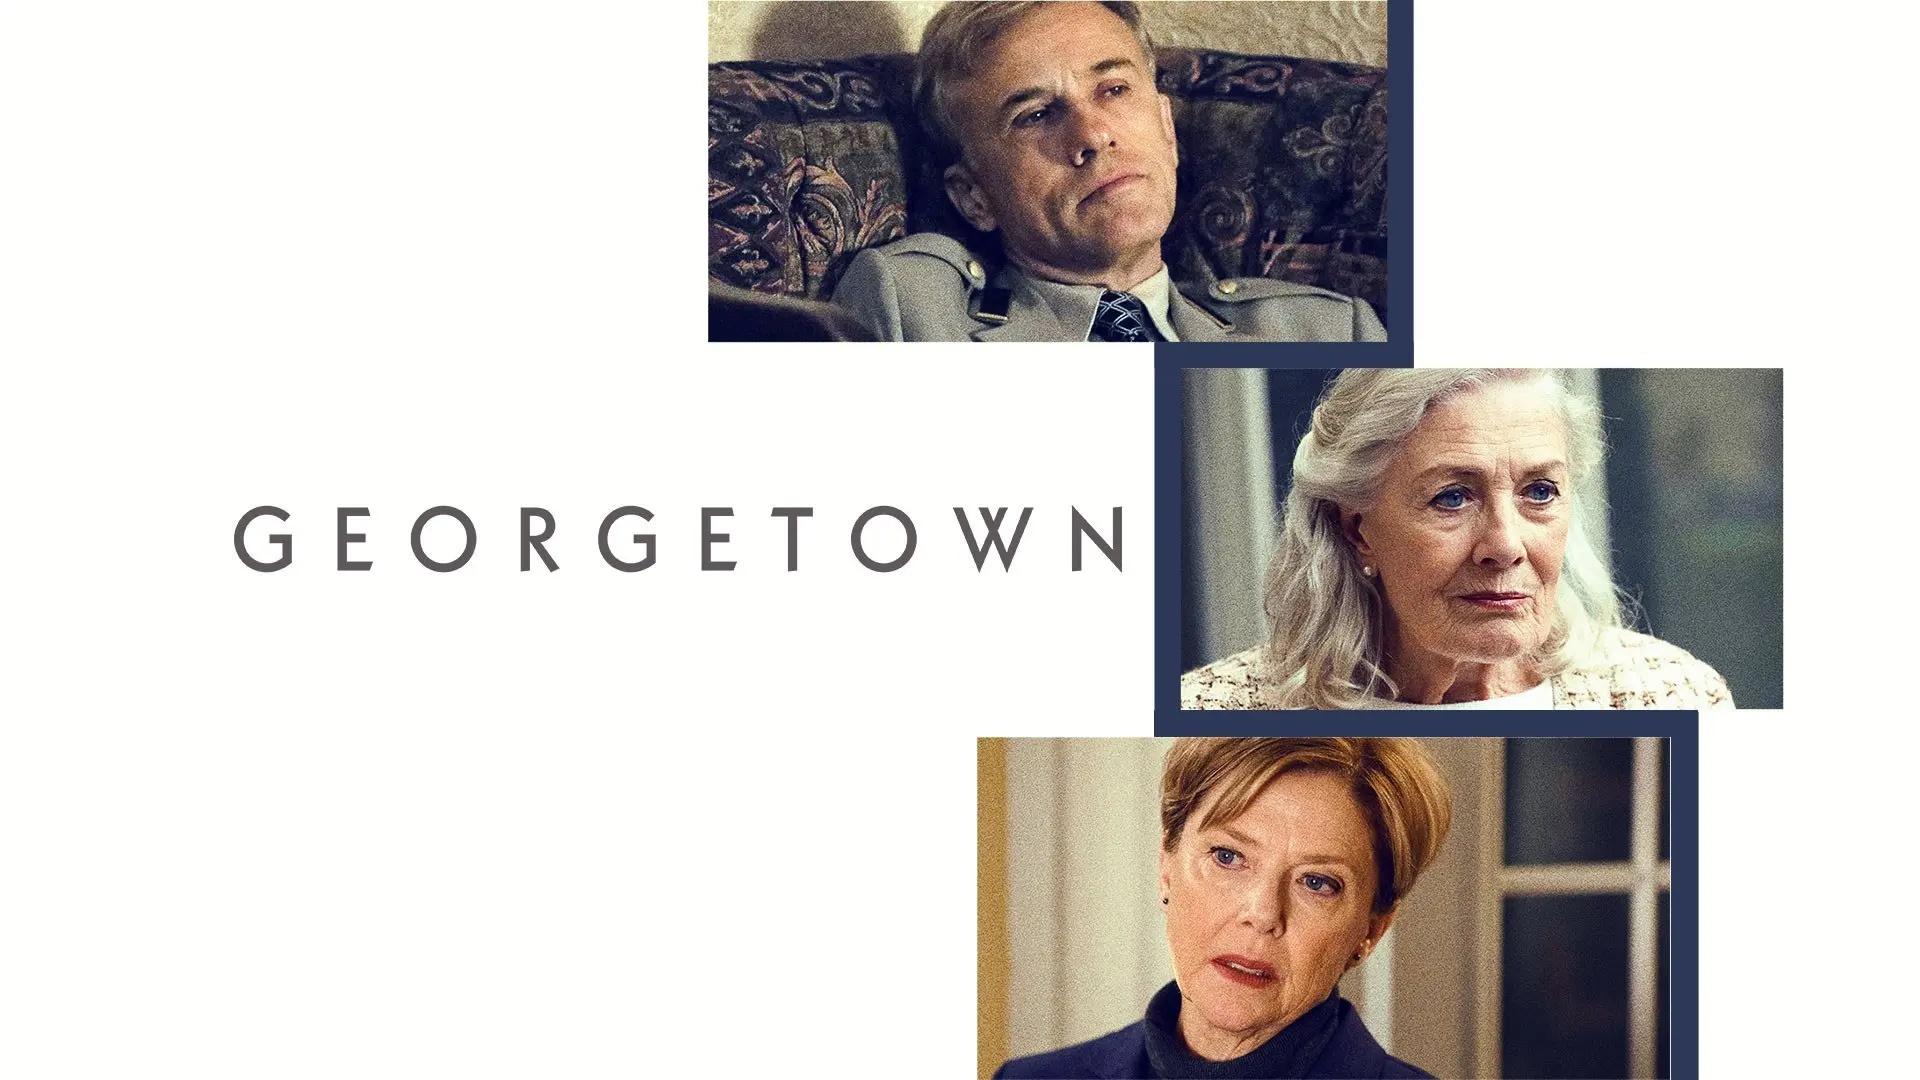 Mercoledi 16 Settembre 2020 Sky Cinema HD, Georgetown